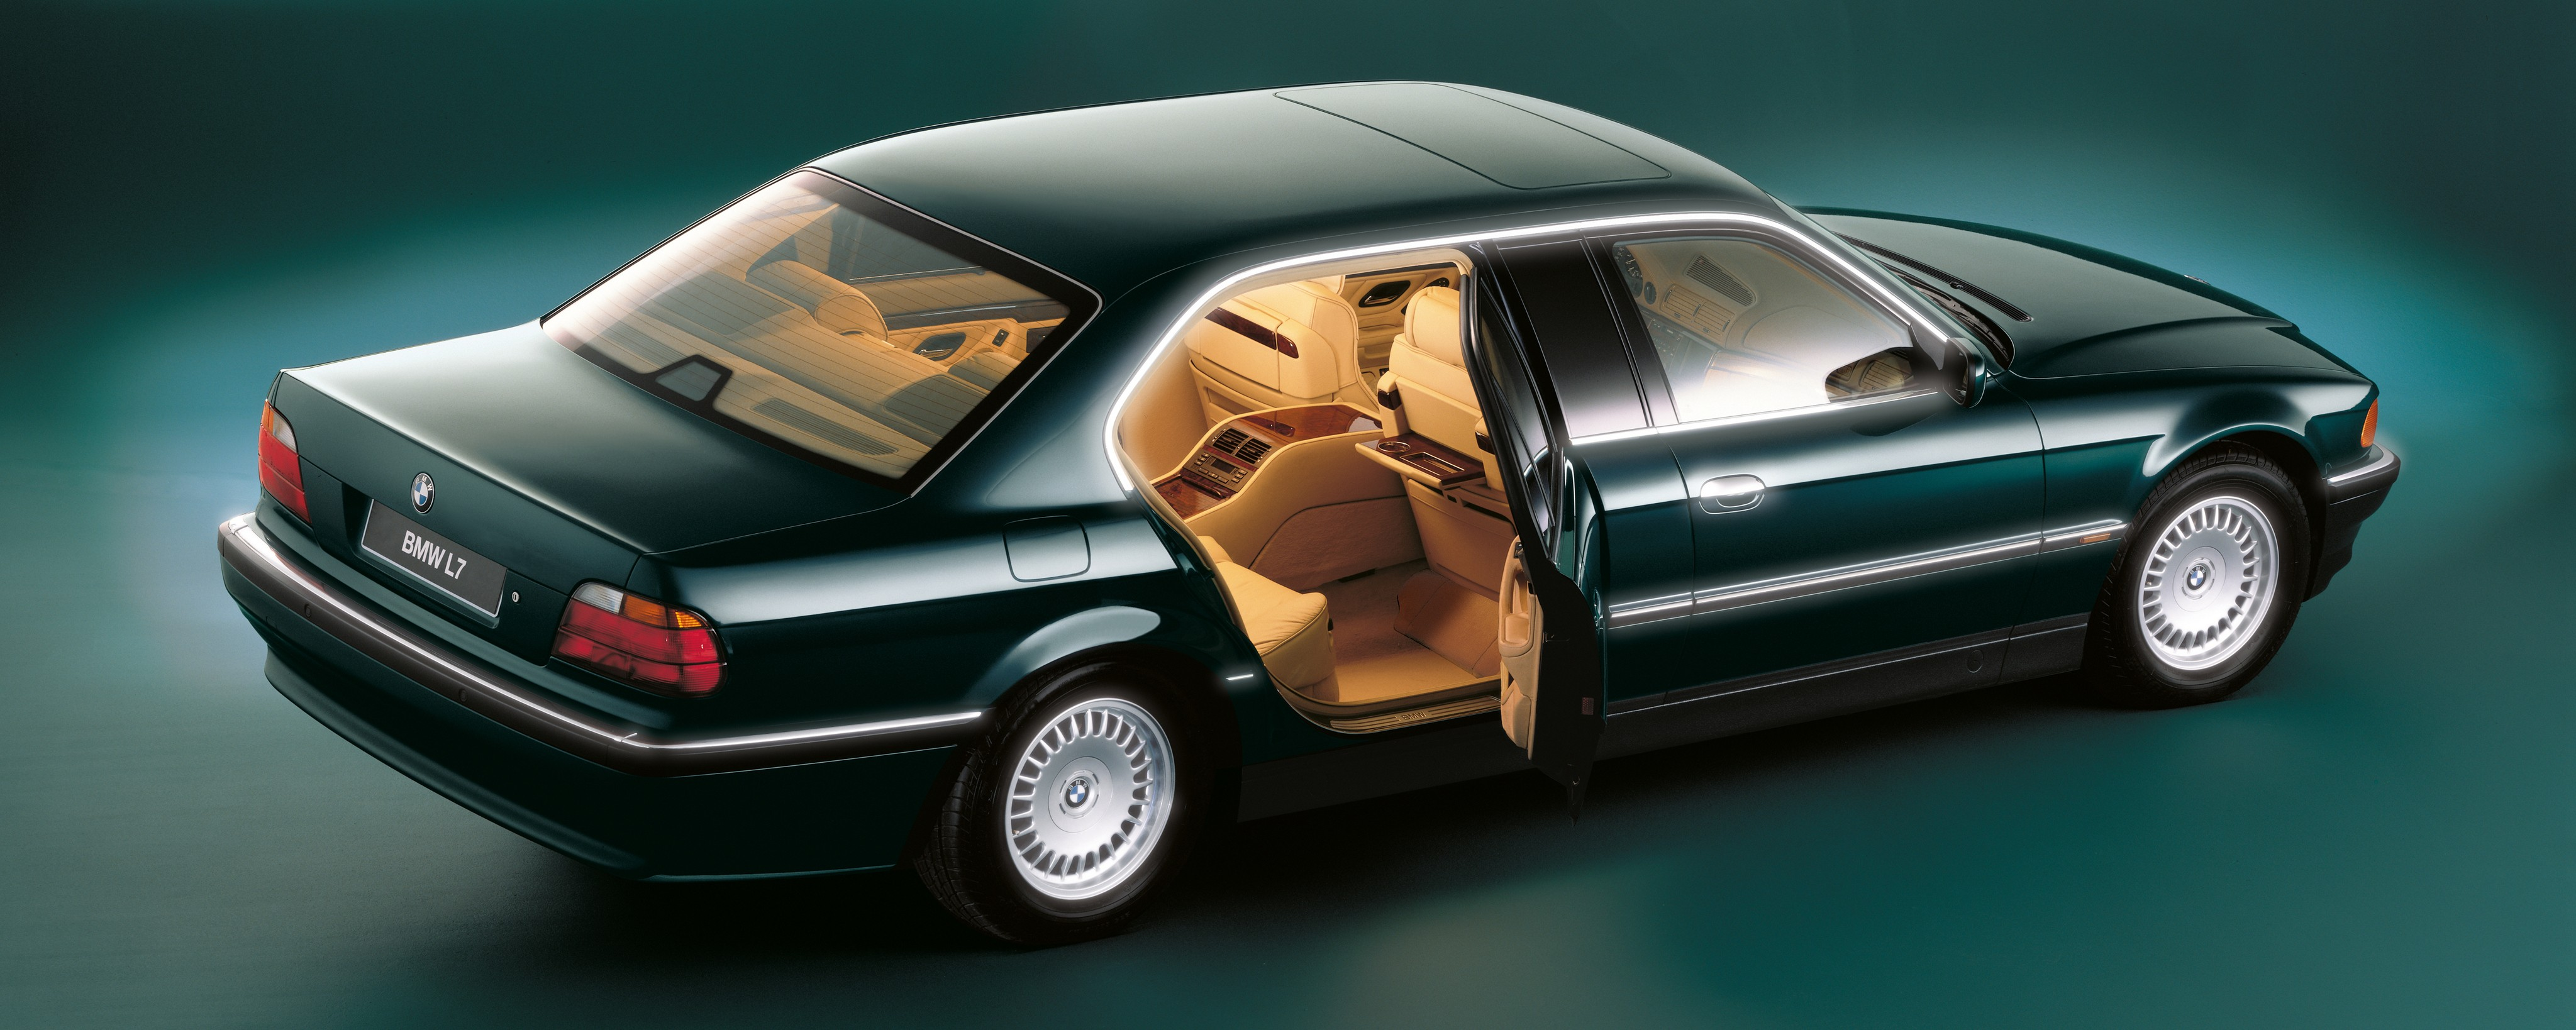 bmw 7 series e38 1994 1995 1996 1997 1998 autoevolution. Black Bedroom Furniture Sets. Home Design Ideas